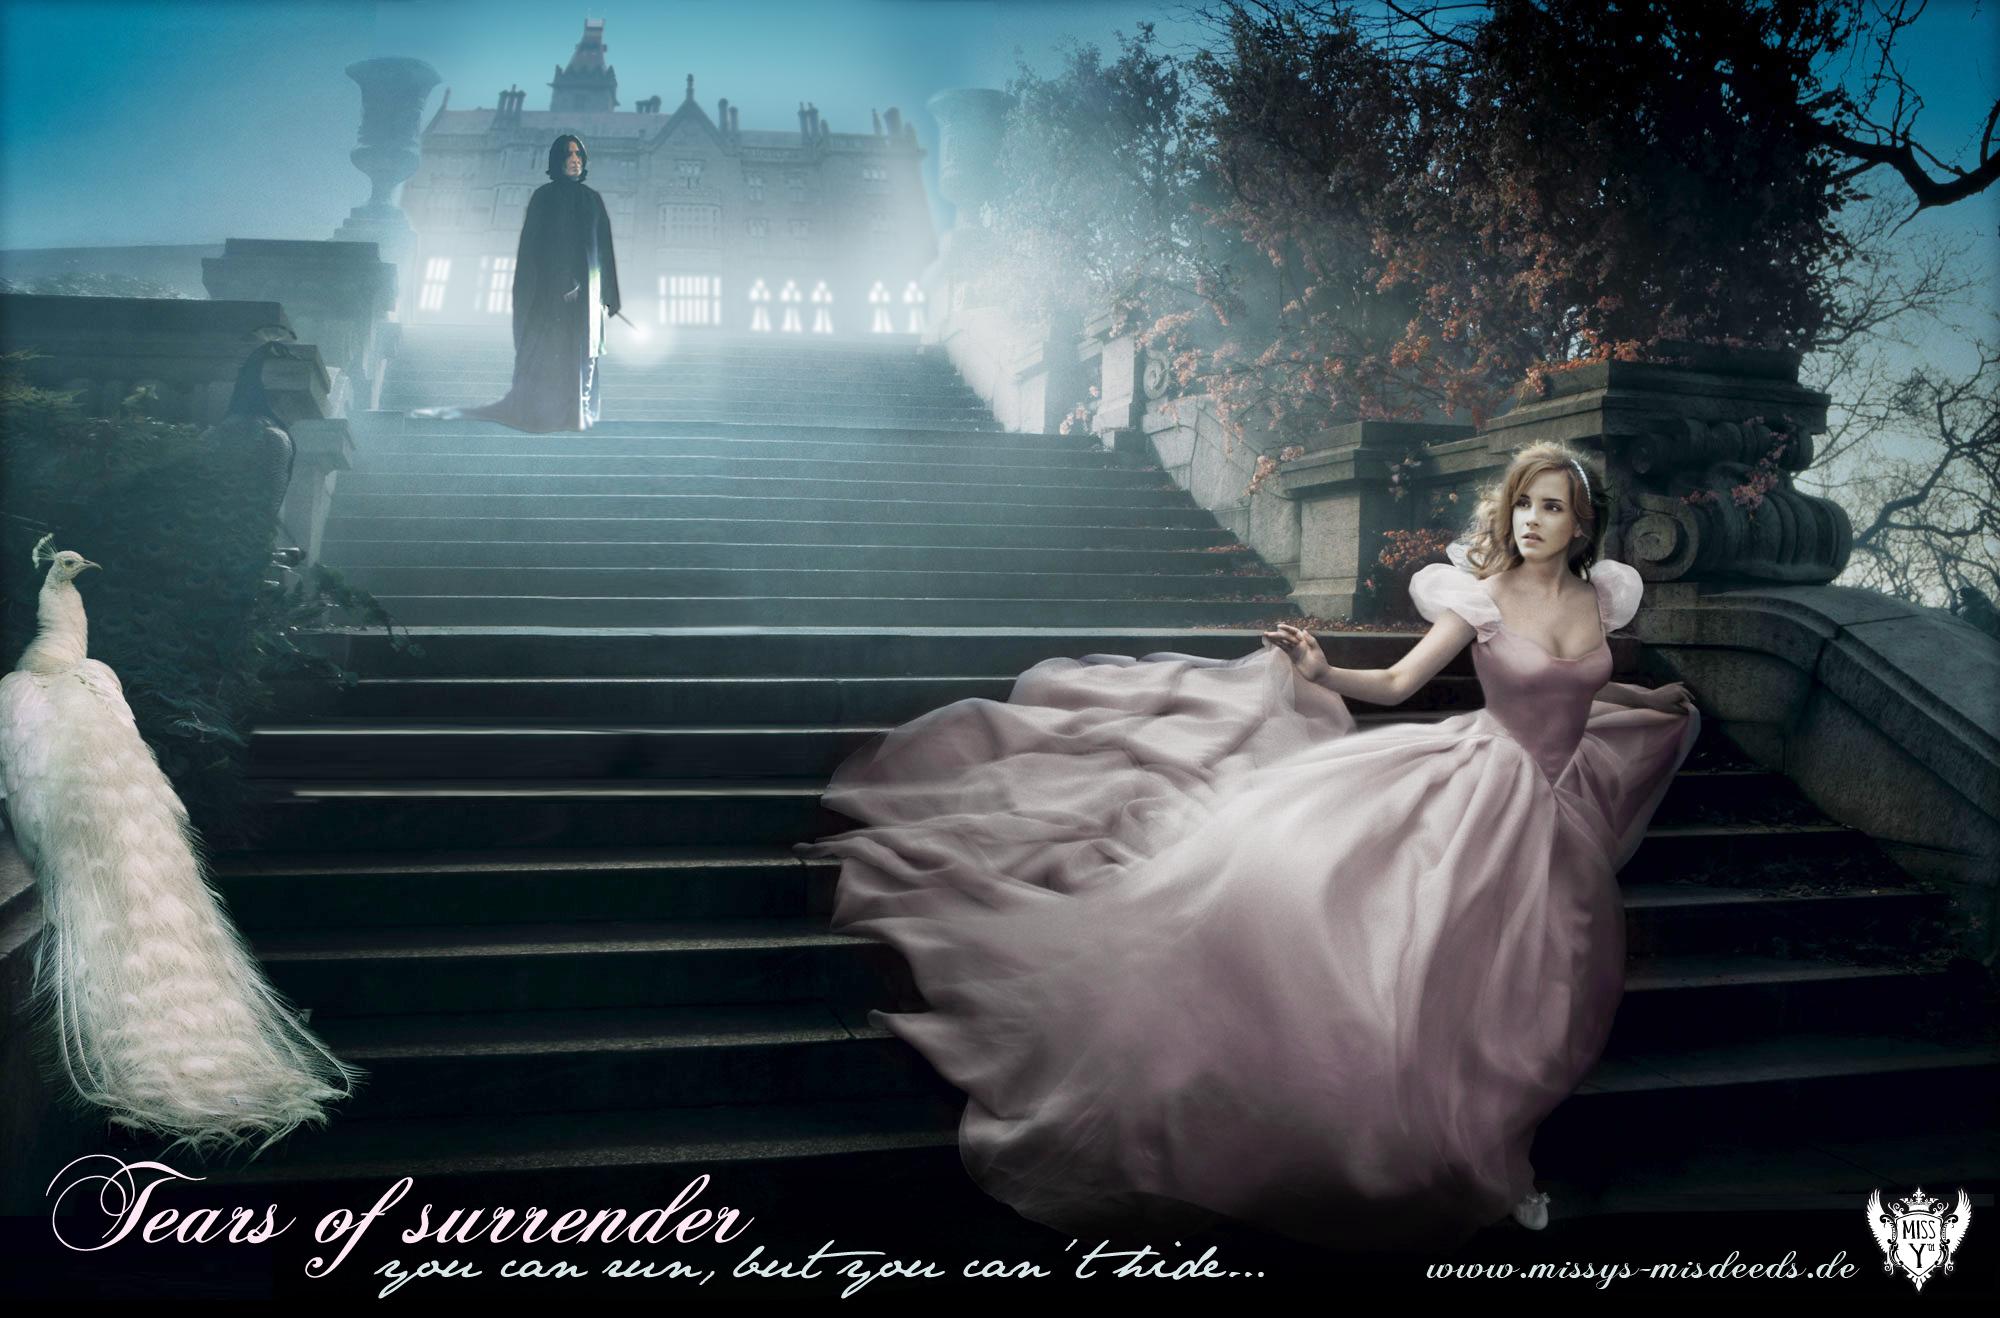 Flyleaf - Beautiful Bride Lyrics Uploaded by